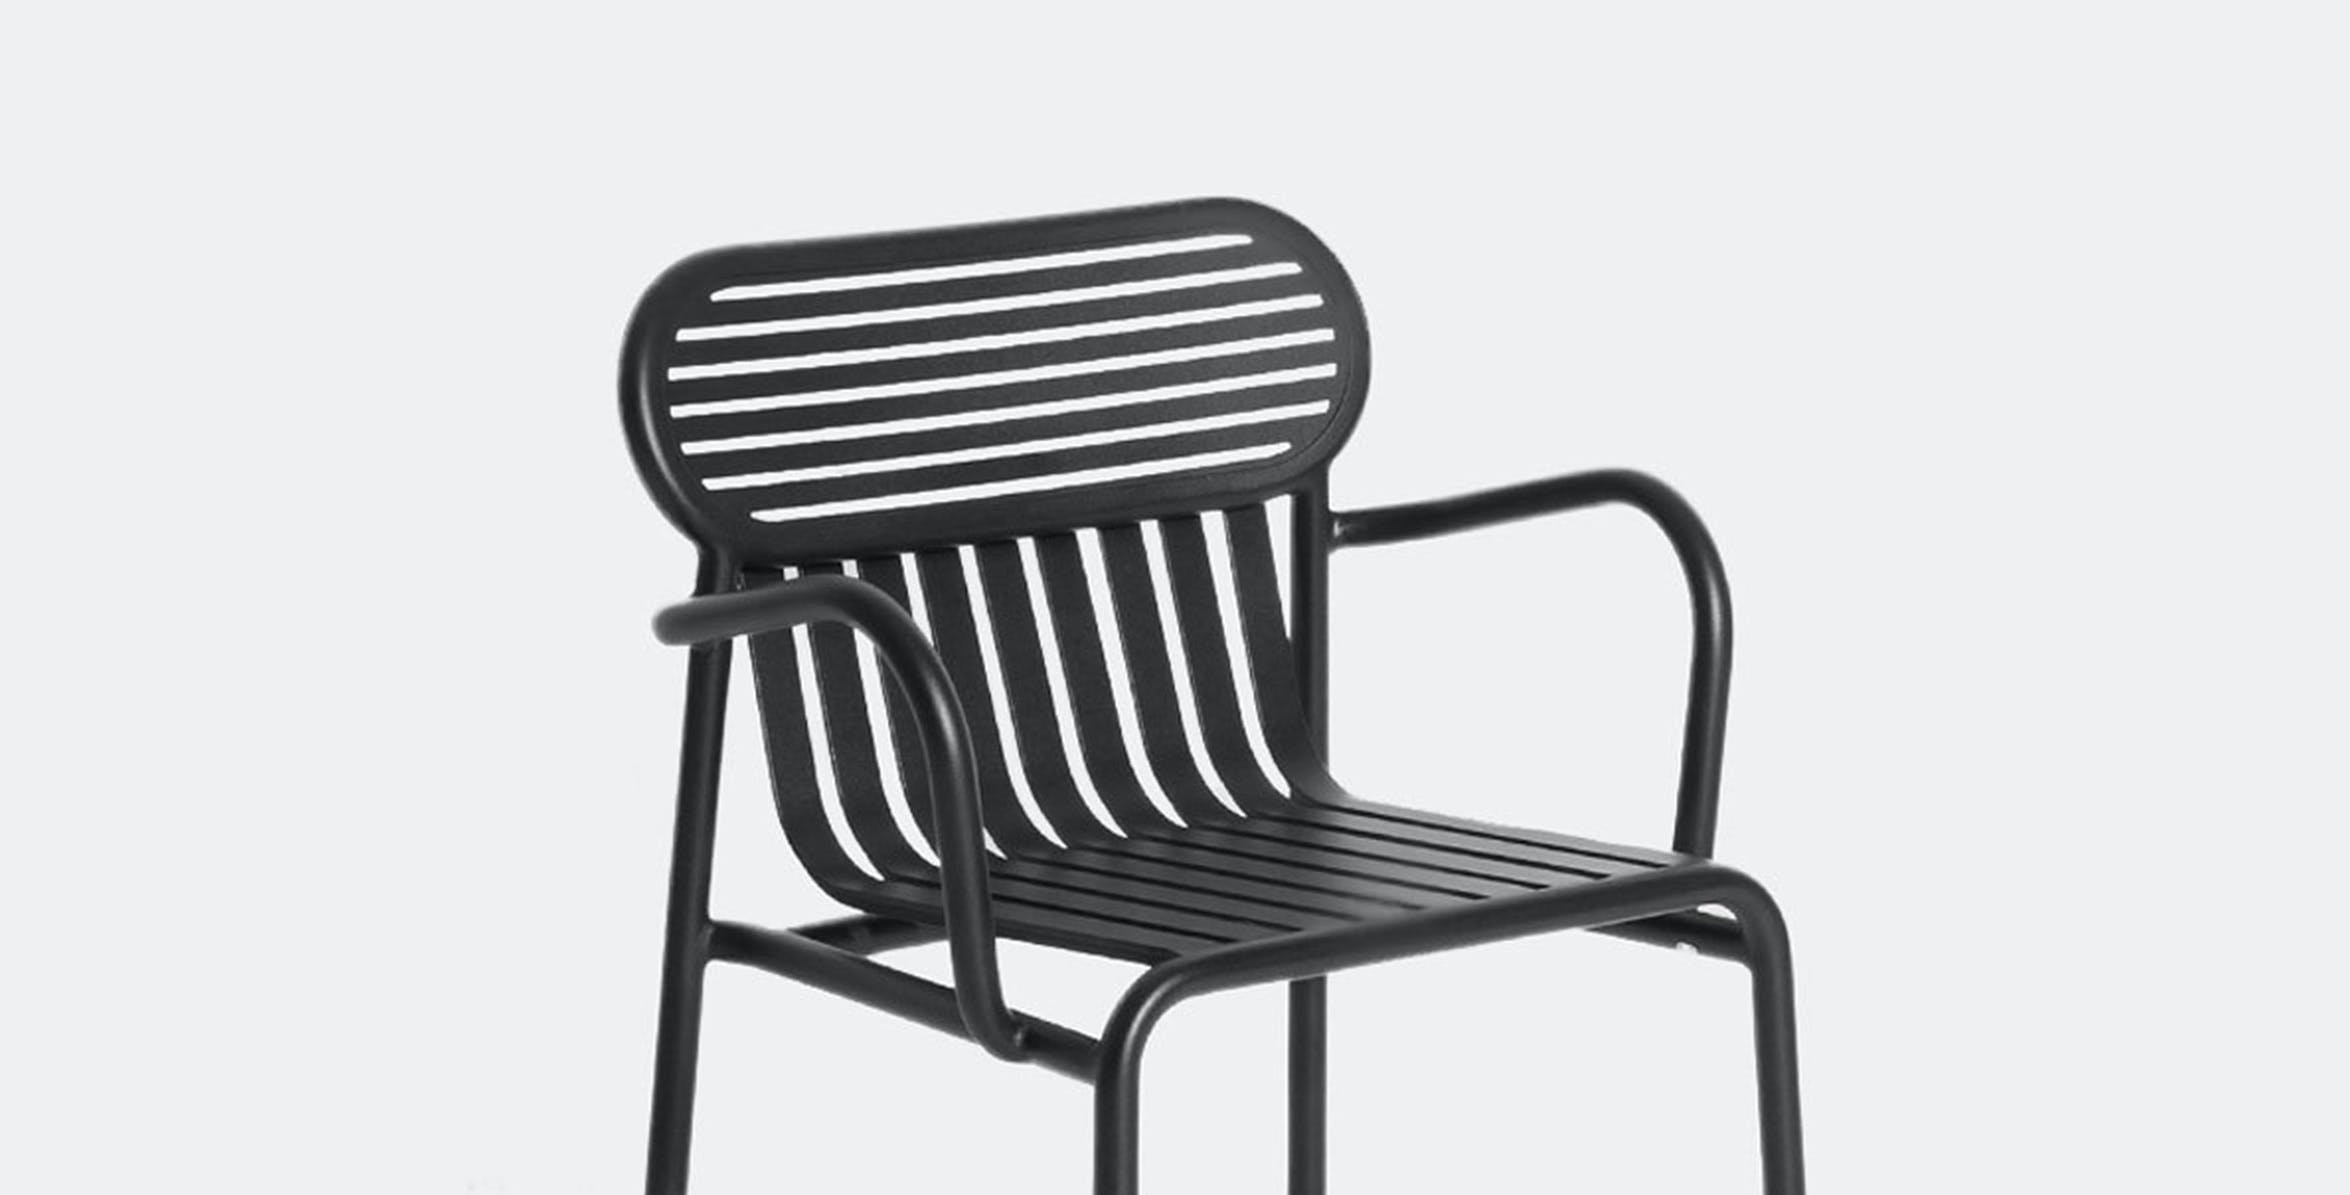 Designer Studio Brichet Ziegler